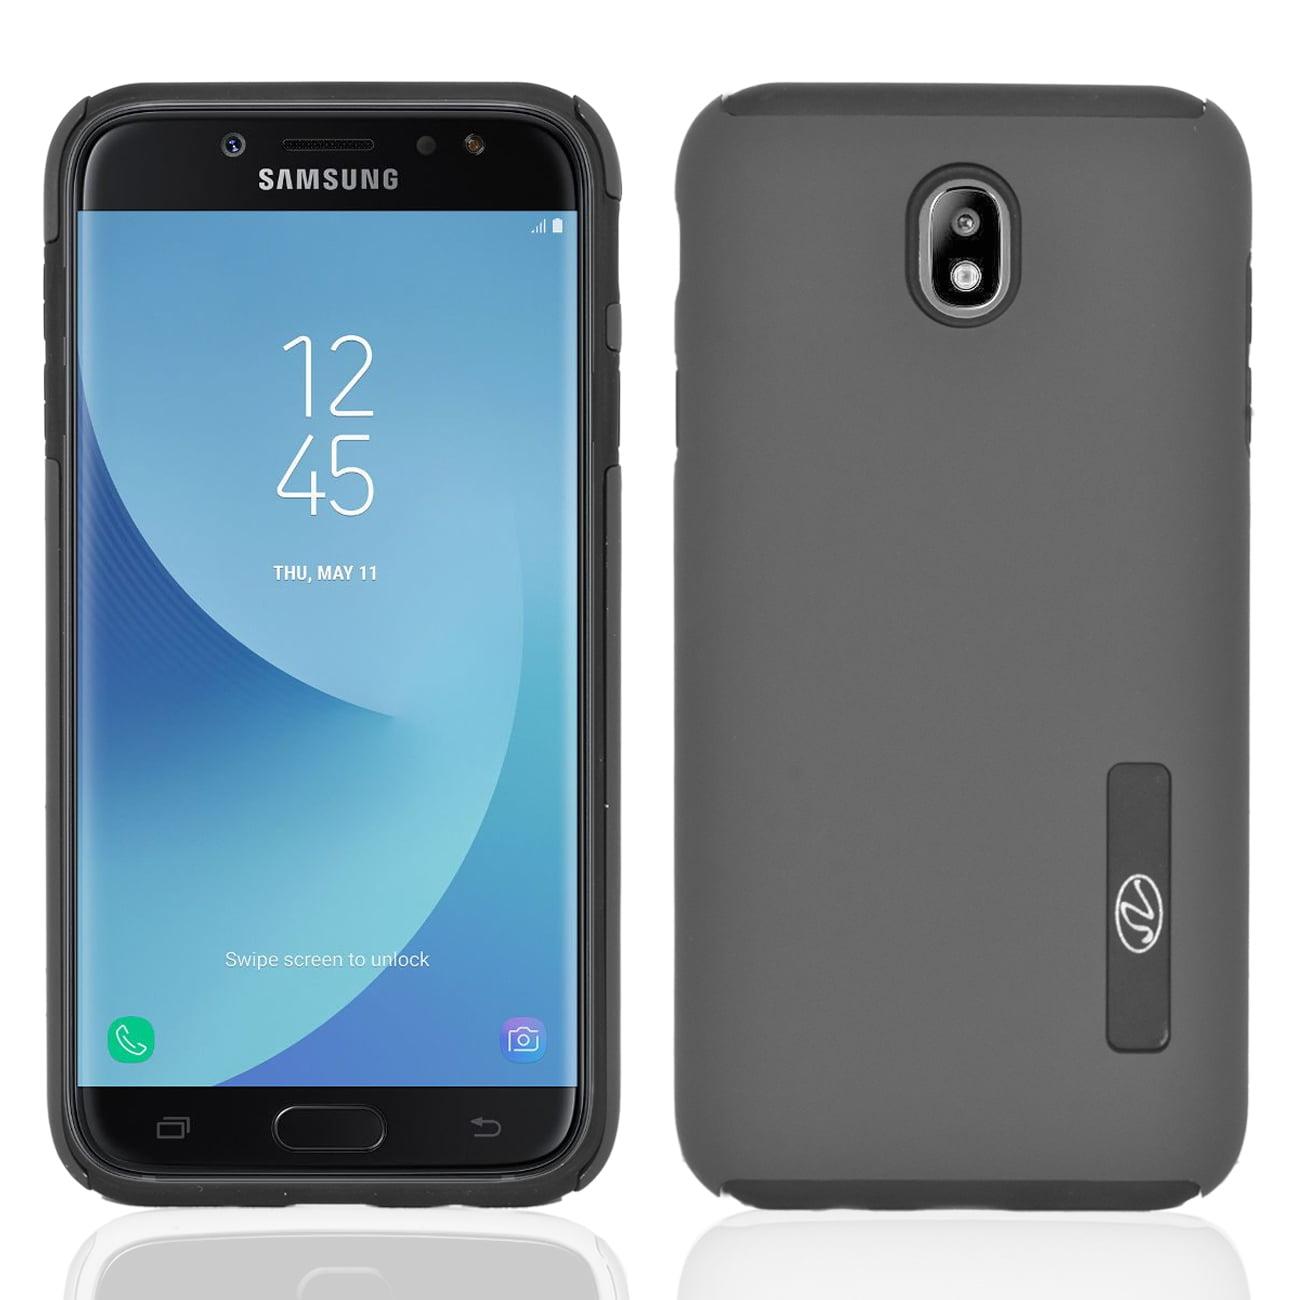 Samsung Galaxy J7 Pro / J730G Slim Rubberized Protective Hybrid Case Cover